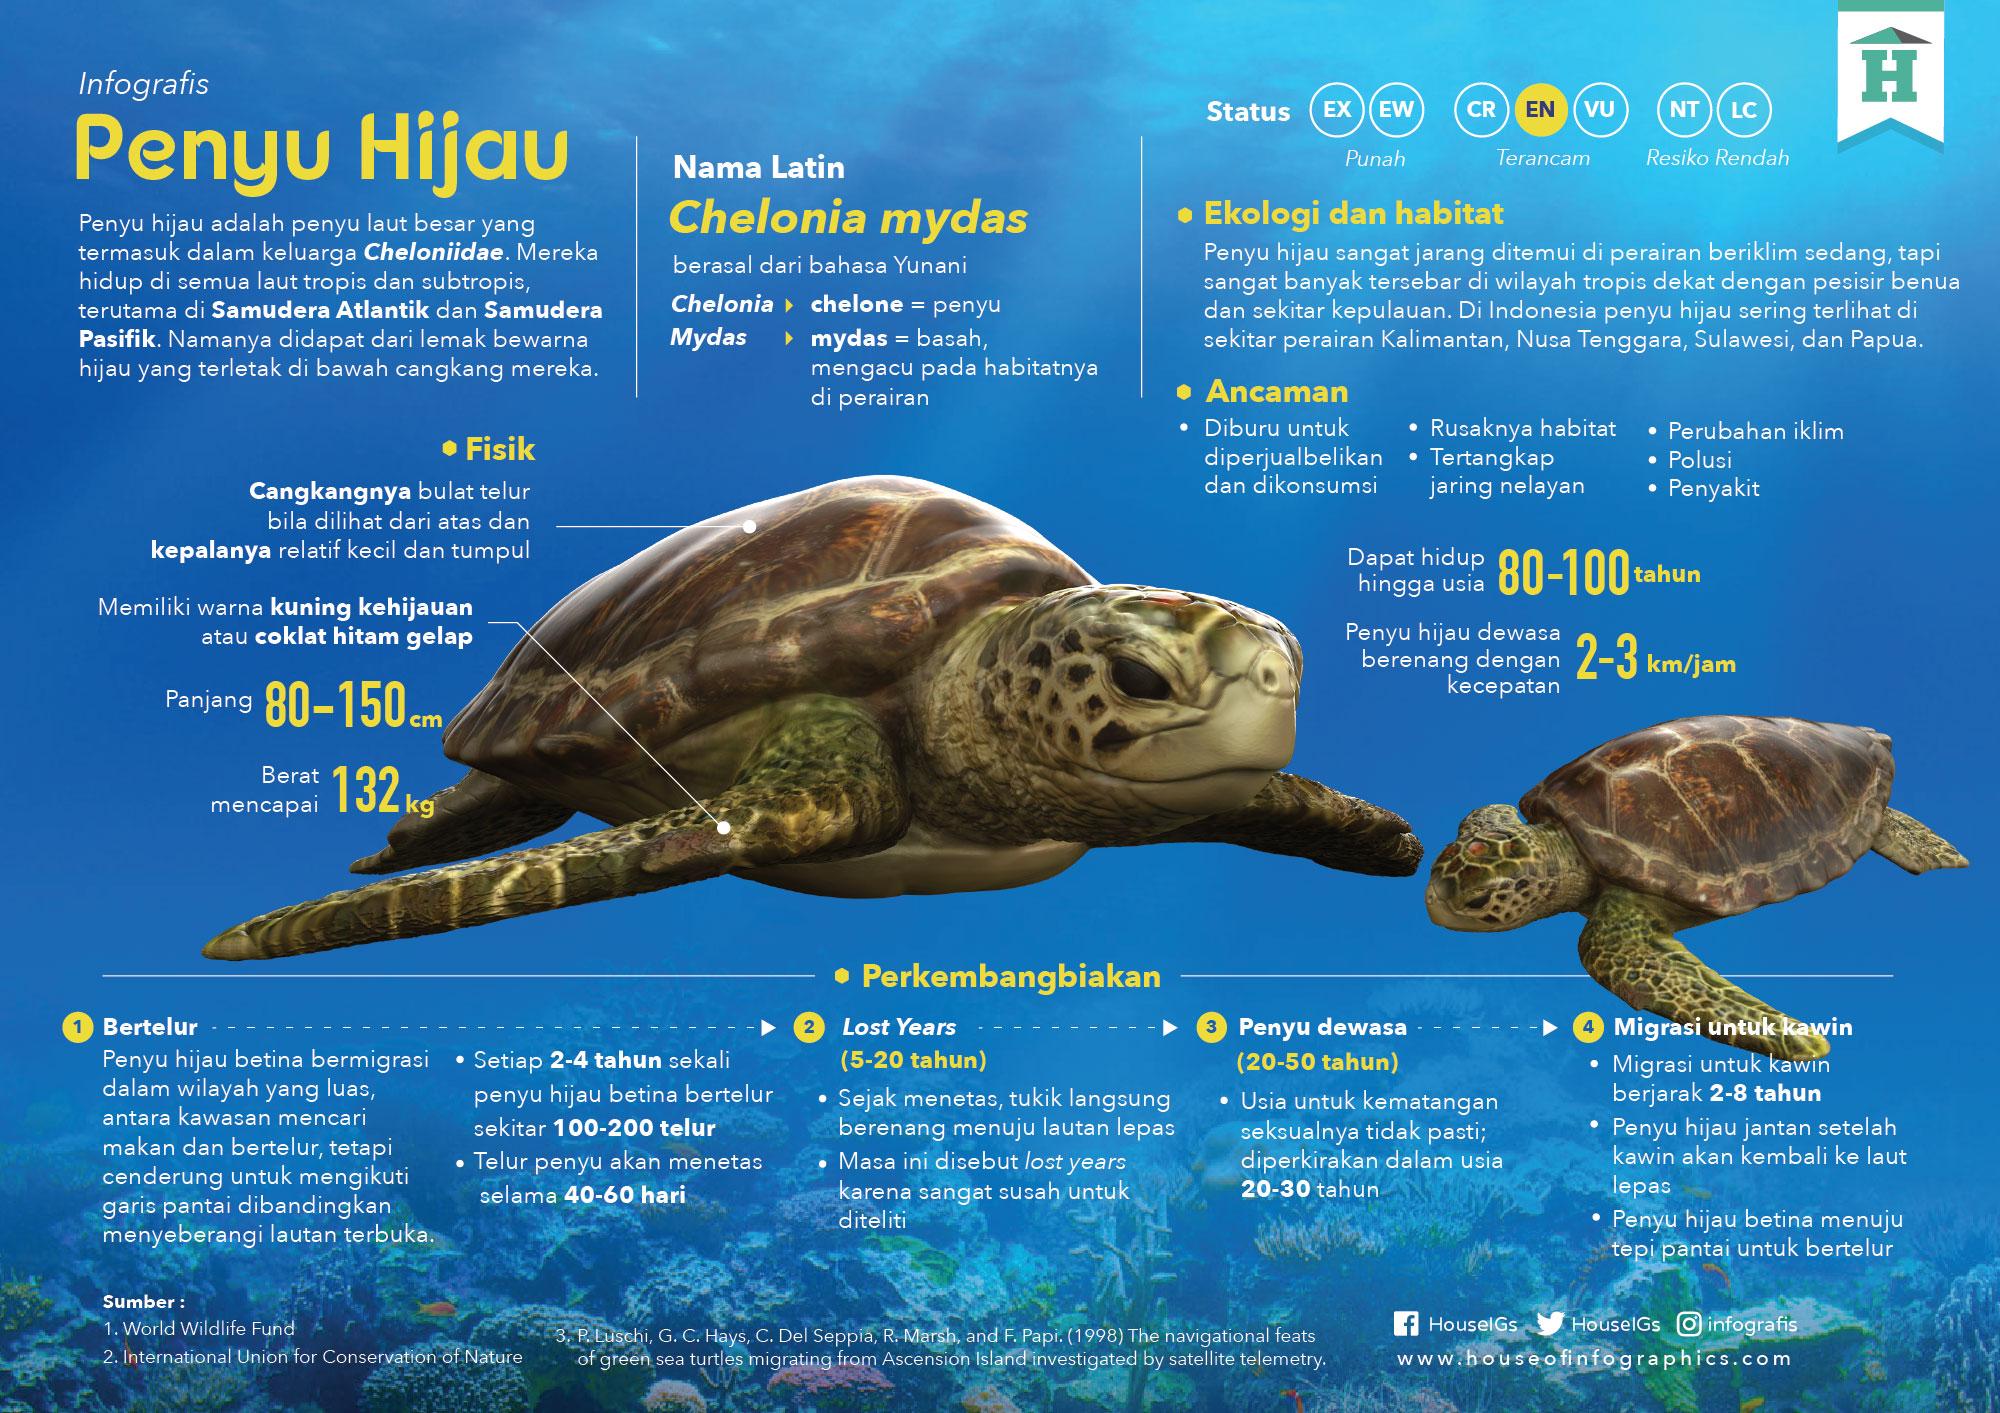 Infografis Penyu Hijau oleh House of Infographics